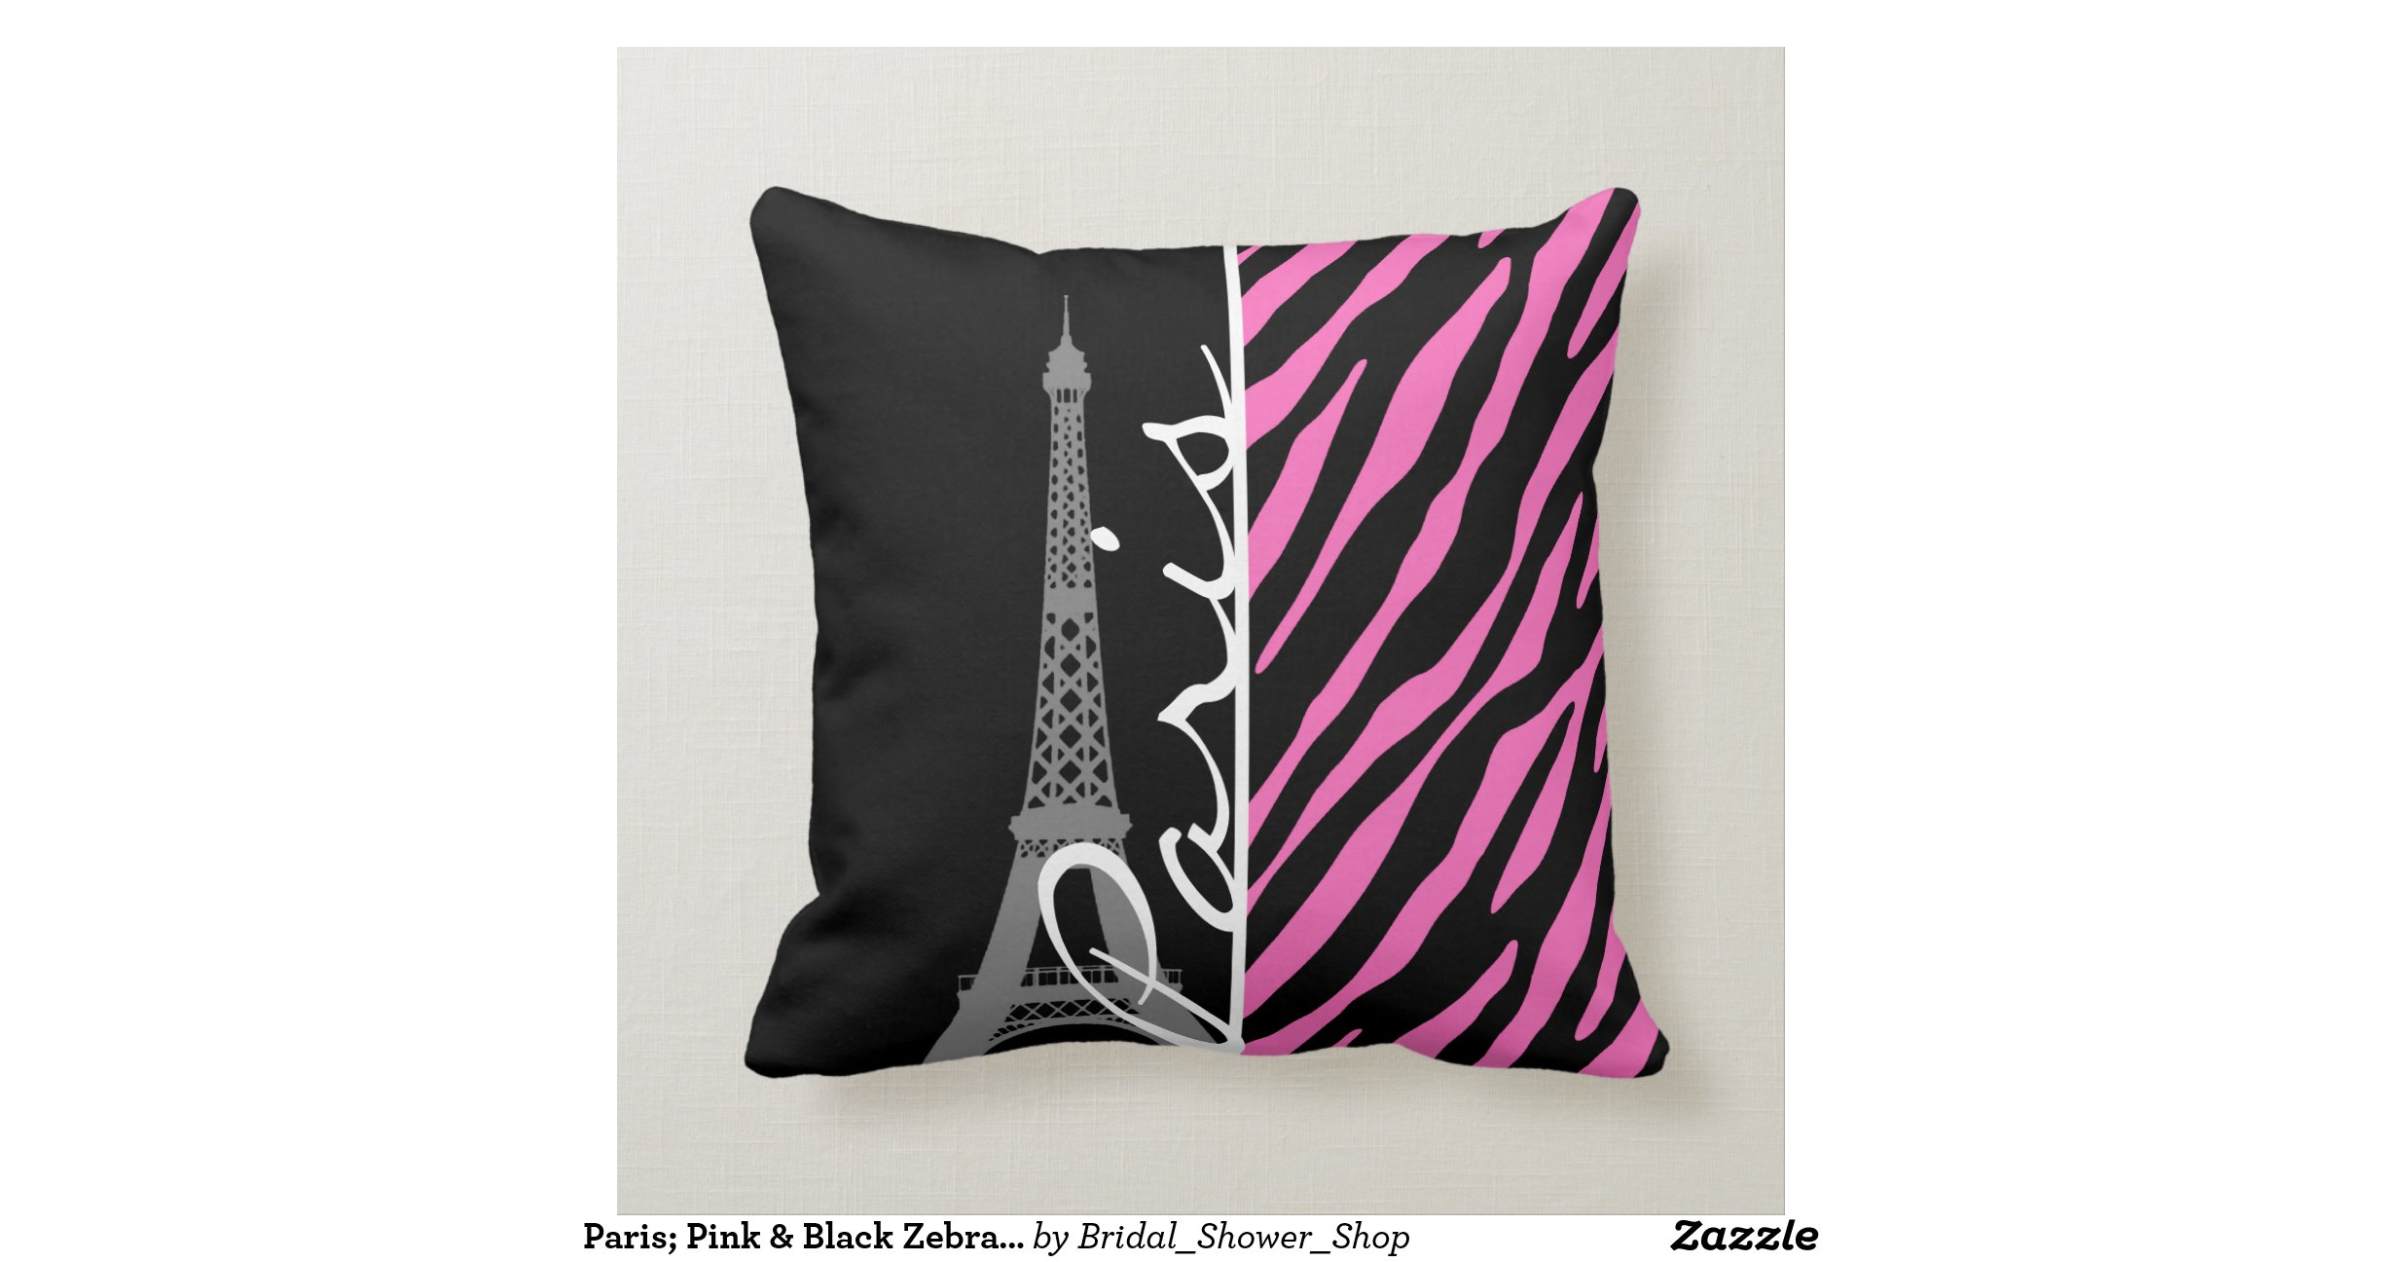 Pink Zebra Print Decorative Pillows : Paris; Pink & Black Zebra Print Throw Pillows Zazzle